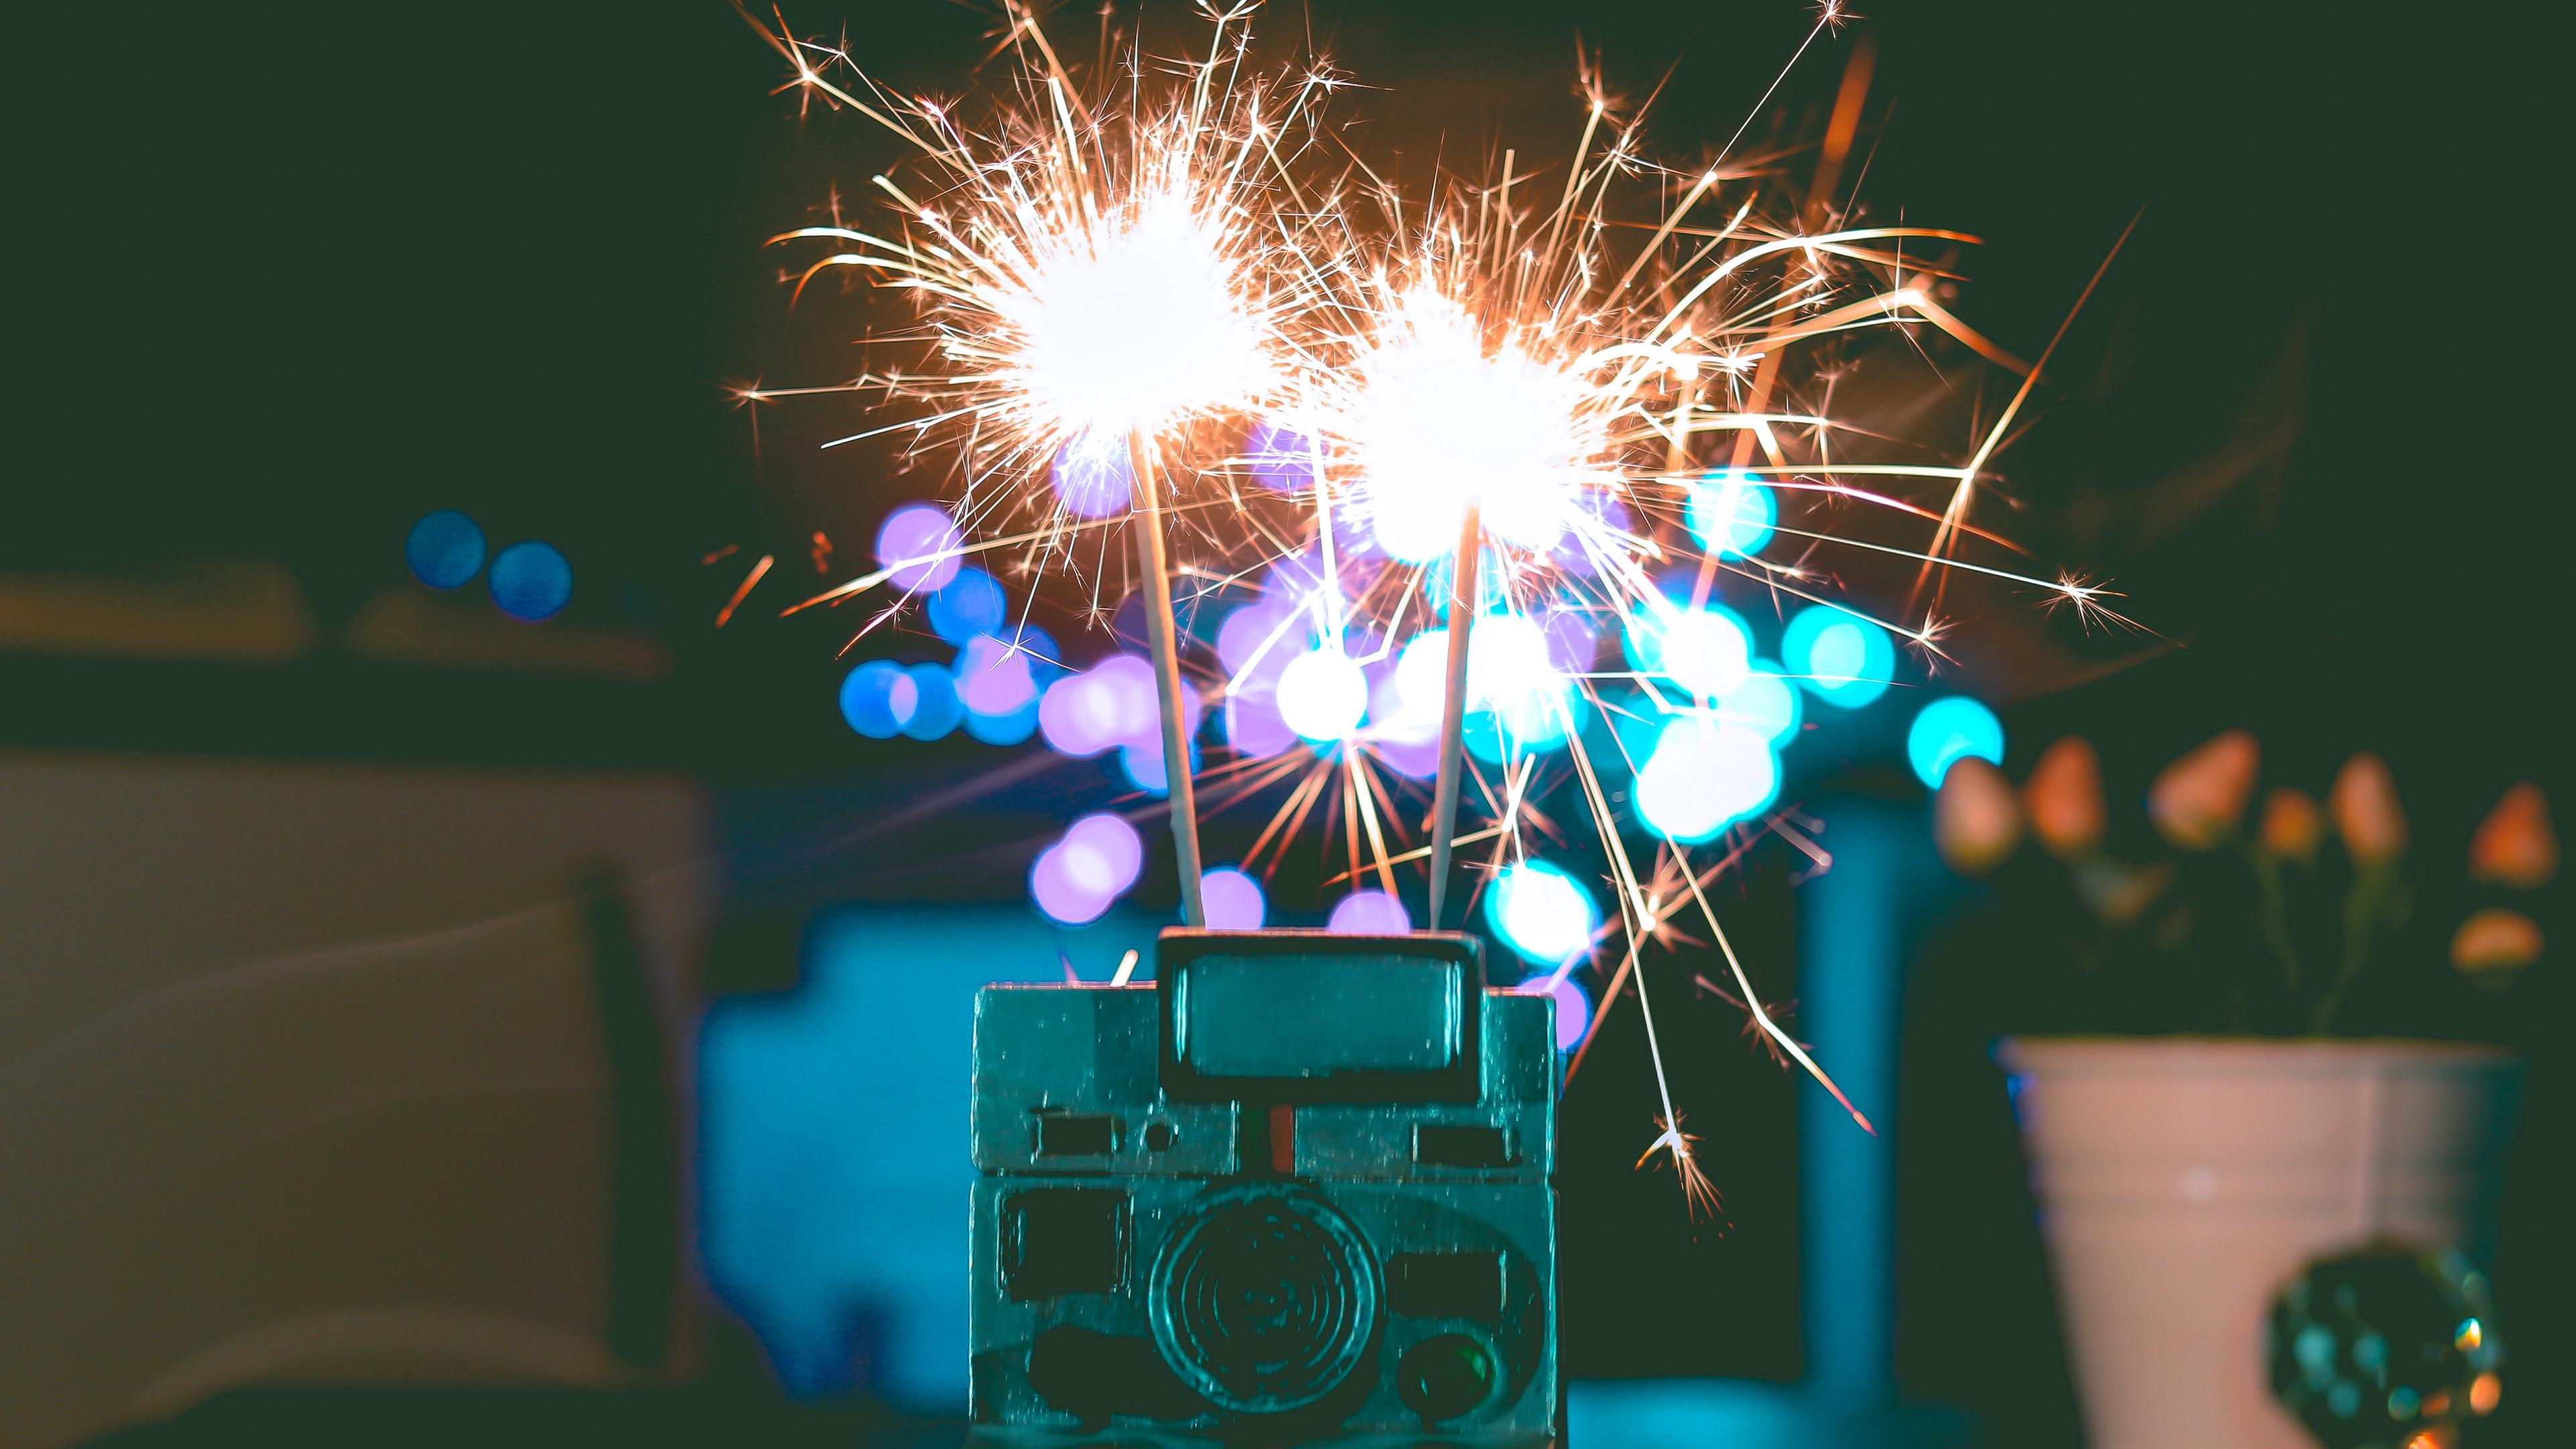 bengal fire polaroid sparks glare 4k 1538344978 - bengal fire, polaroid, sparks, glare 4k - Sparks, polaroid, bengal fire